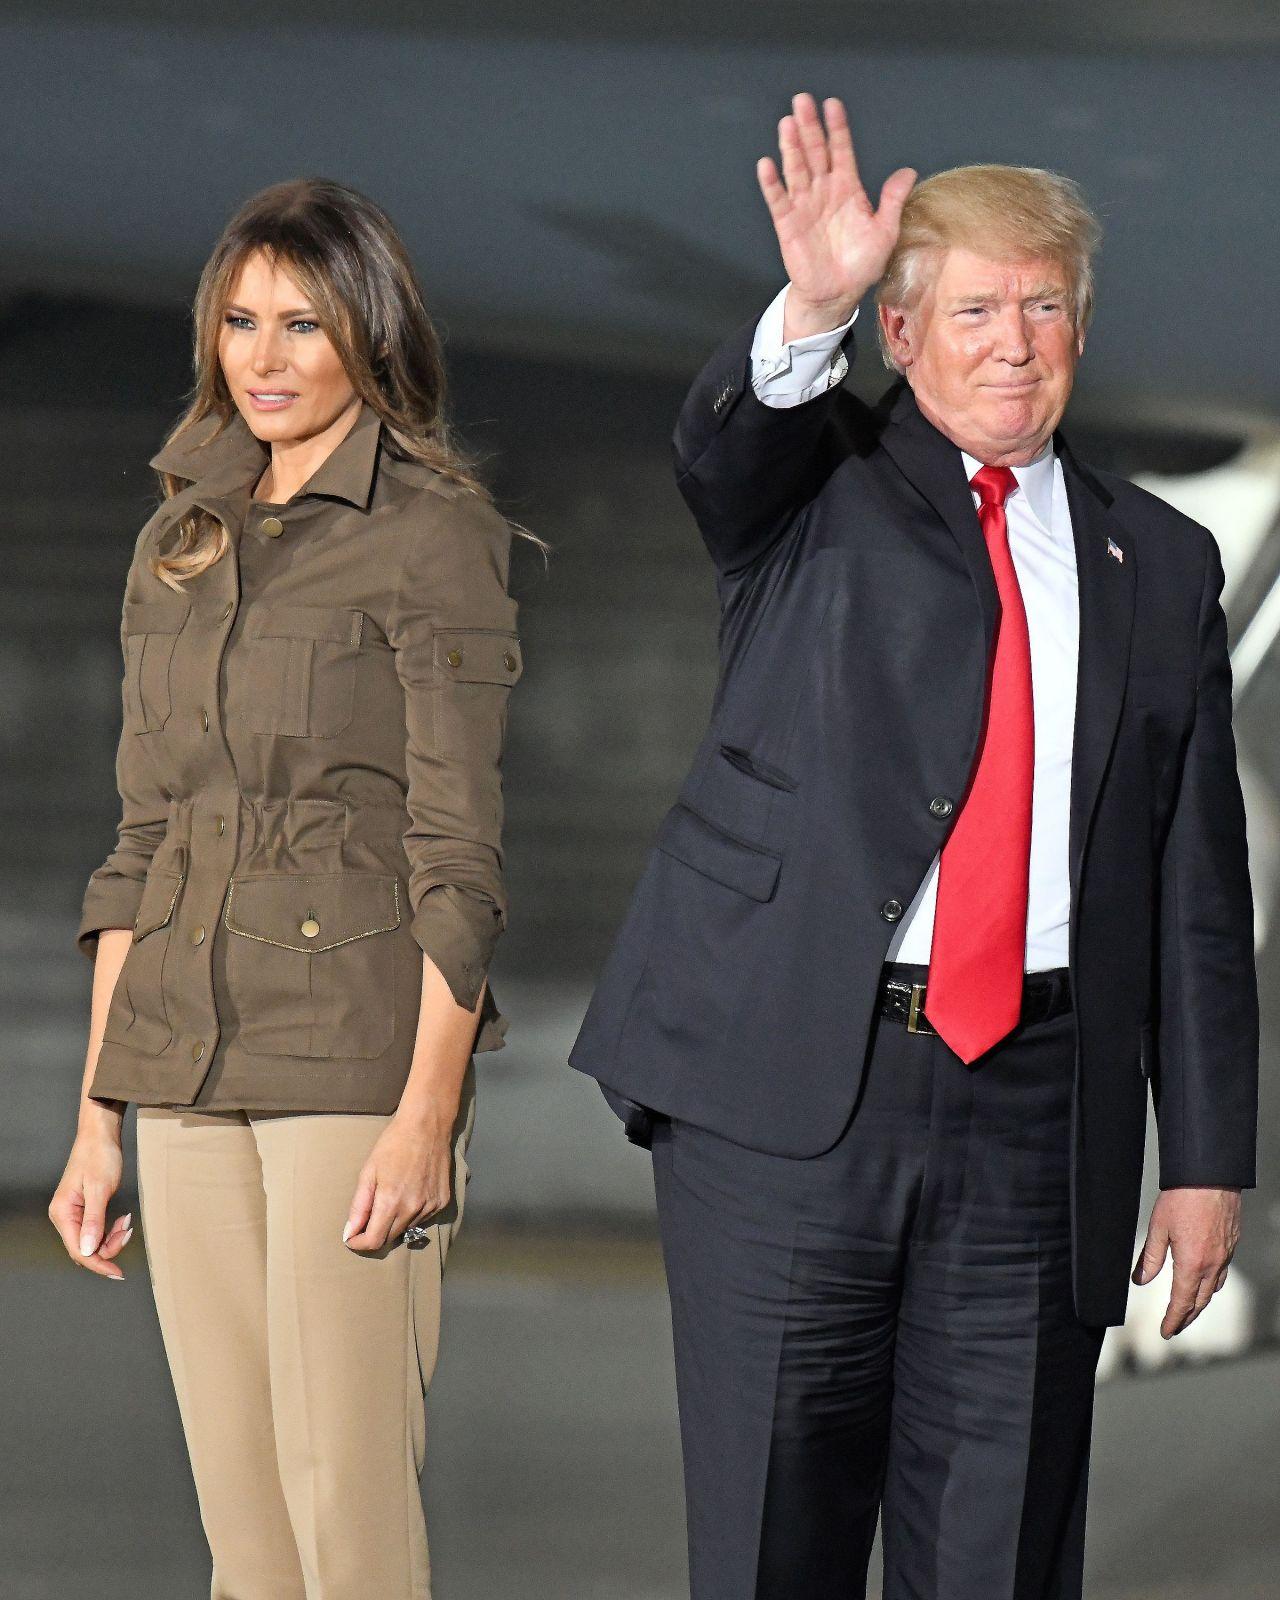 Melania Trump and Donald J. Trump - Maryland 09/15/2017